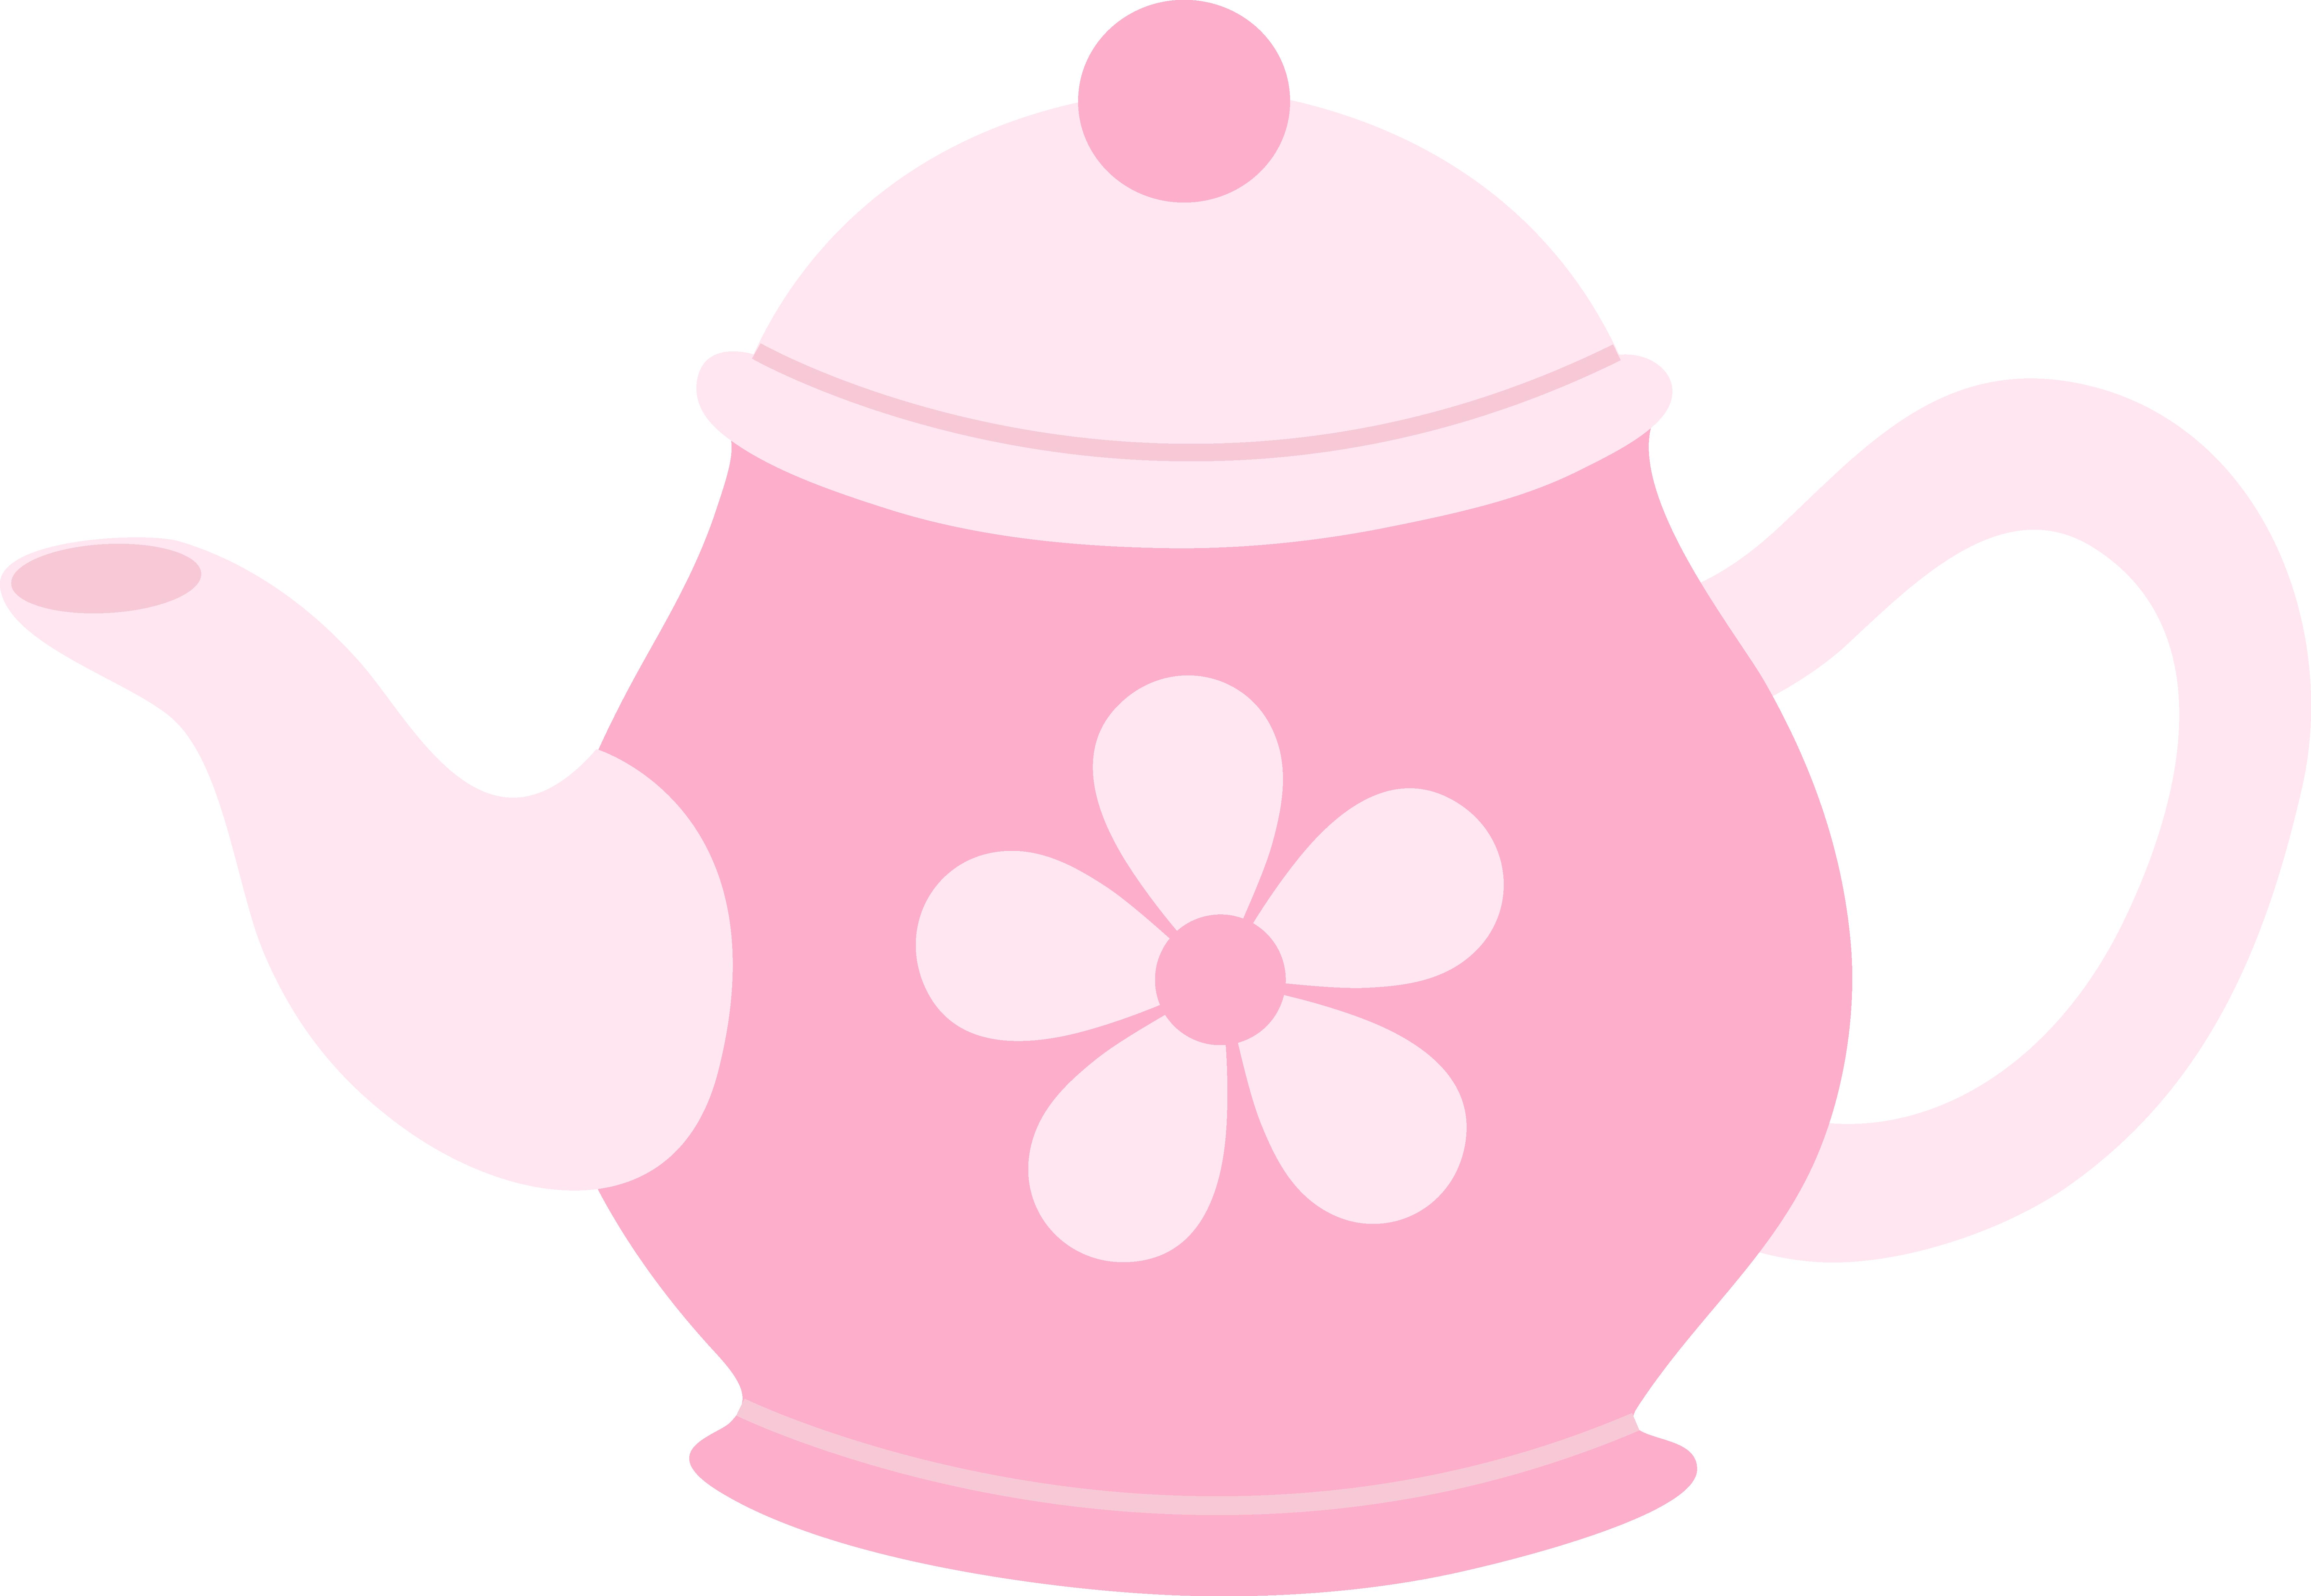 Teapot clipart cute Daisy Flower With Teapot Pink